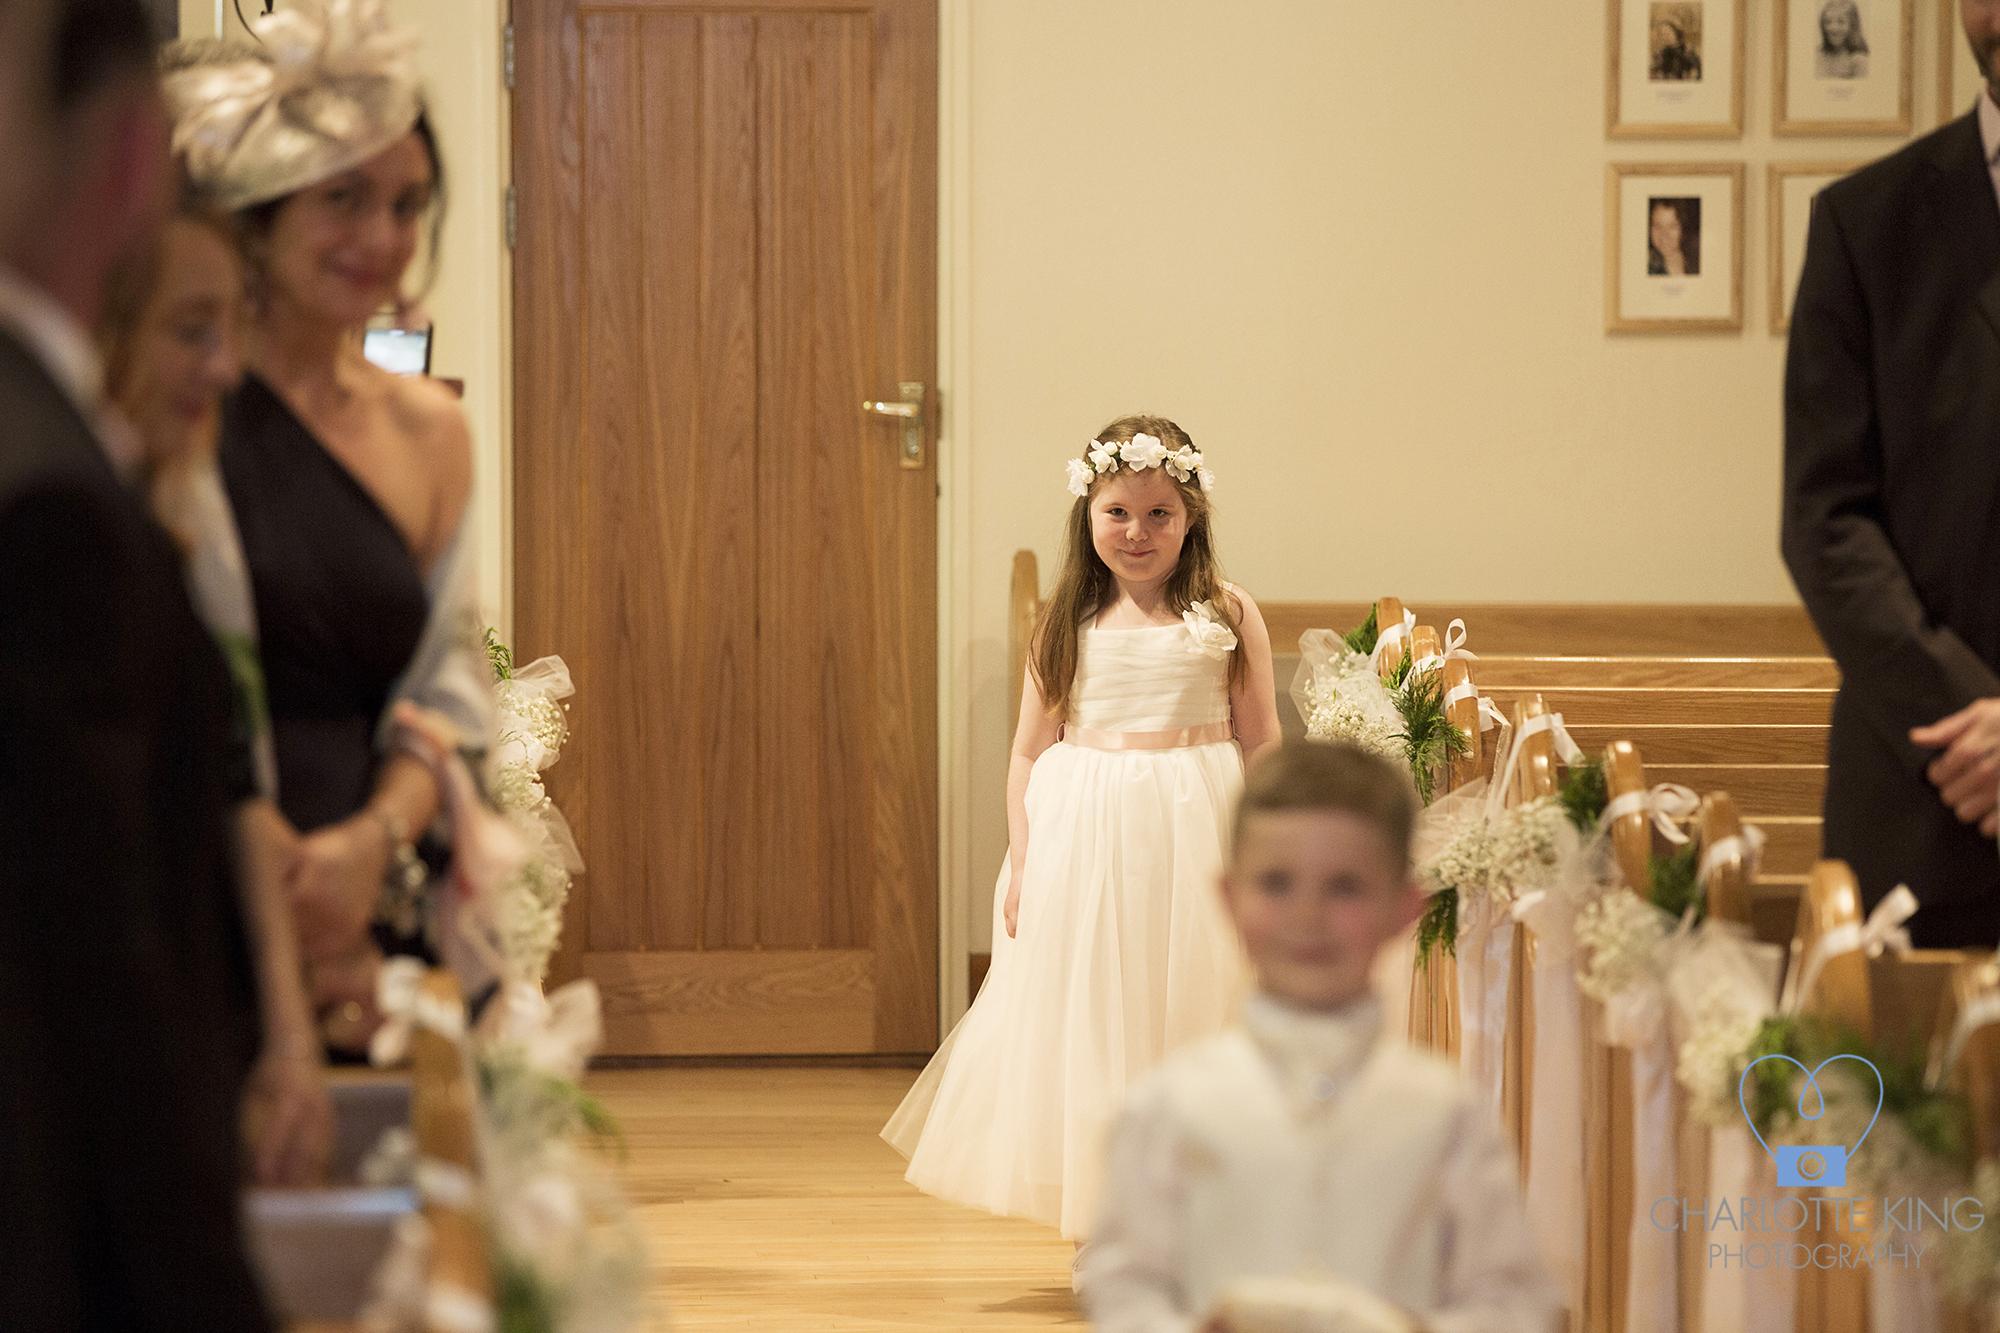 Woldingham-school-wedding-charlotte-king-photography (37)